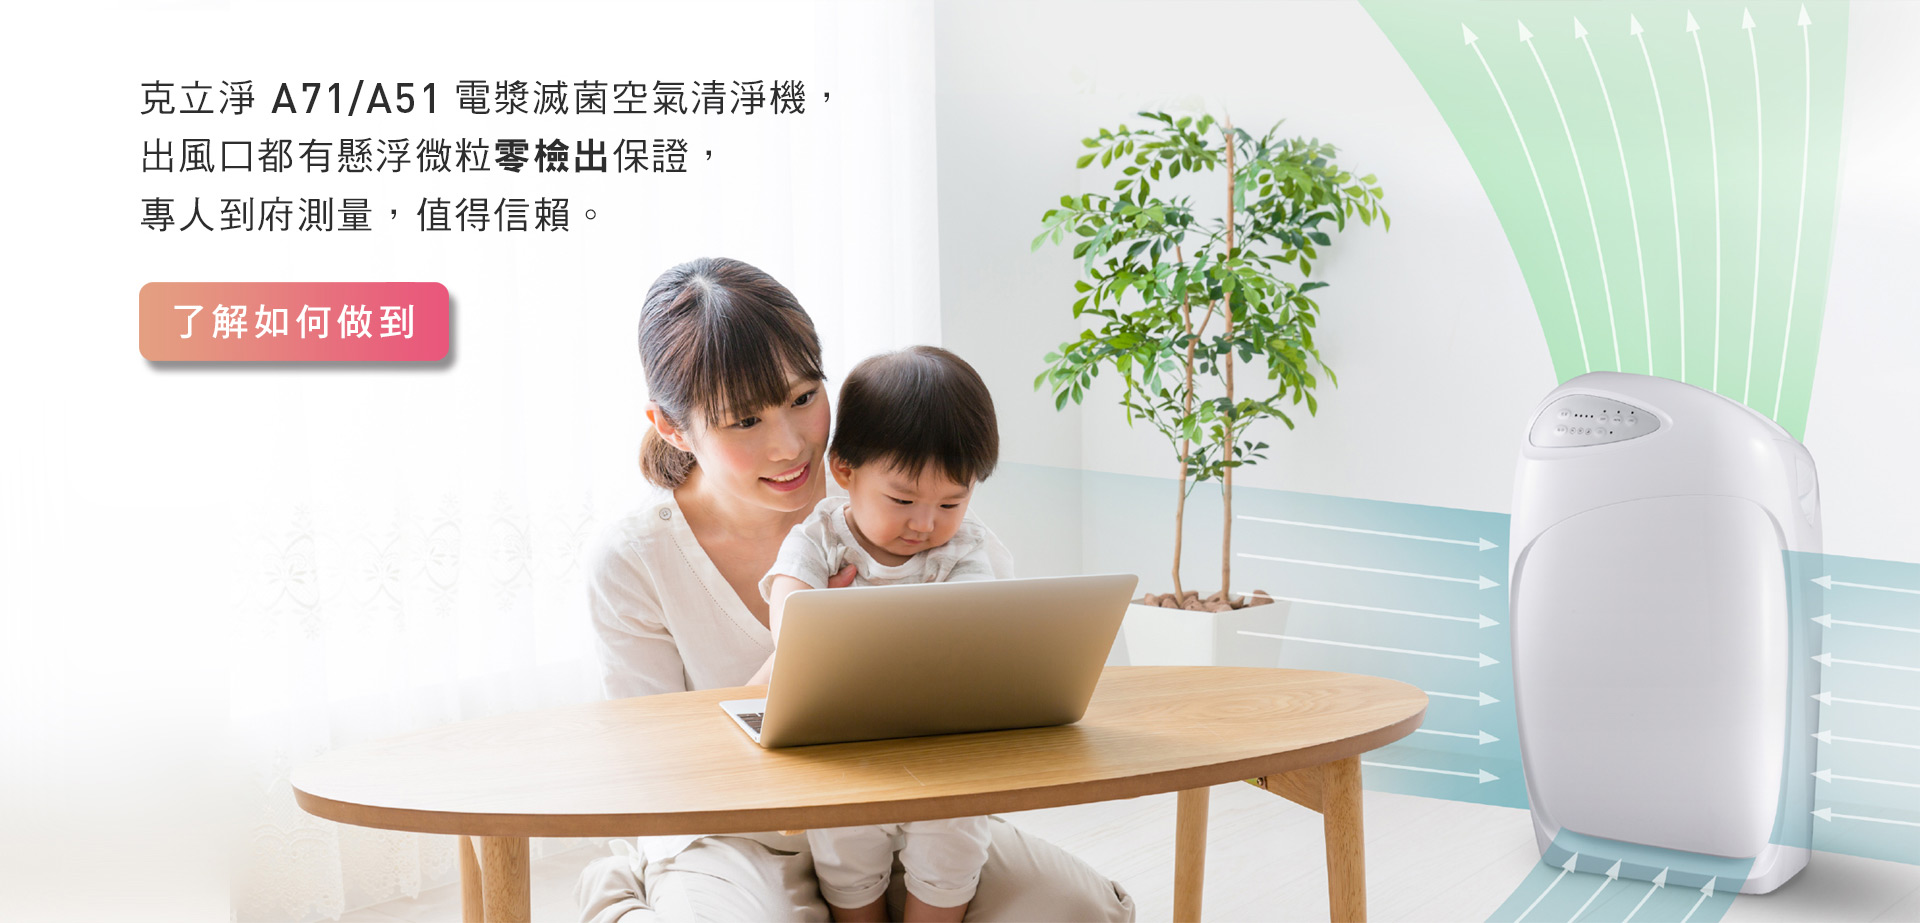 NEW週年慶LP_PC_20191112_v4_03